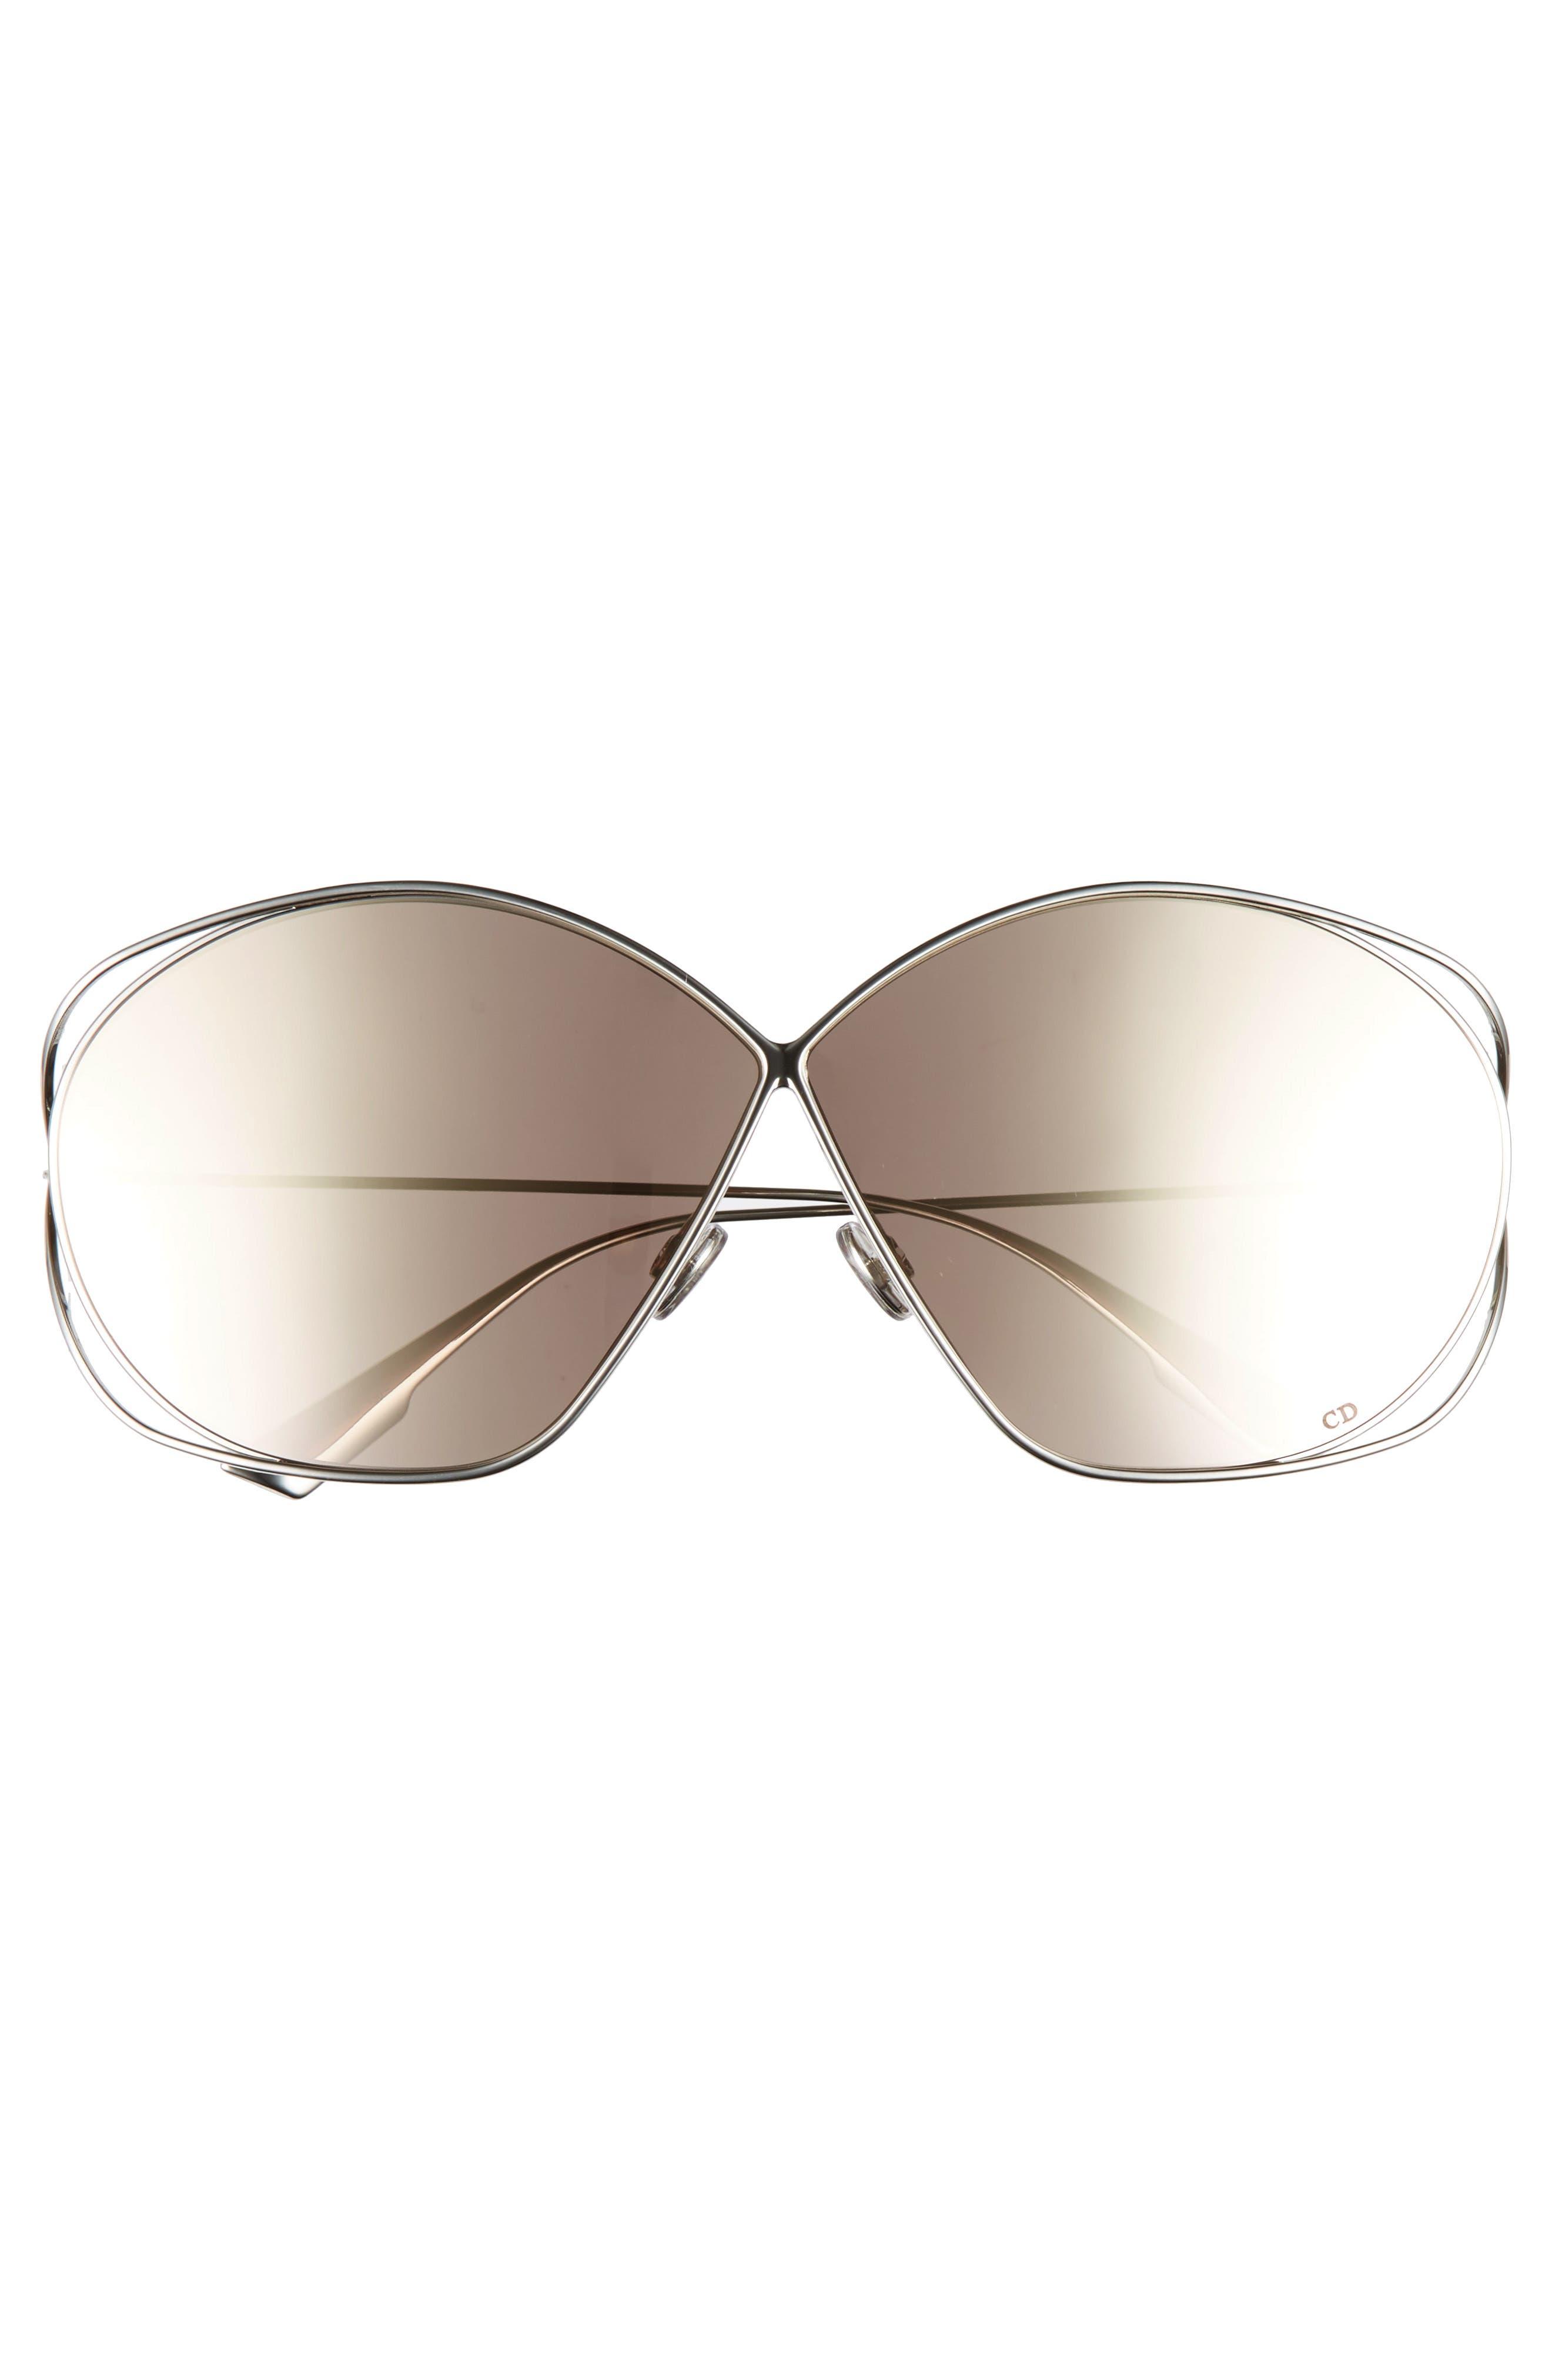 Stellaire 2 68mm Oversize Butterfly Sunglasses,                             Alternate thumbnail 3, color,                             PALLADIUM